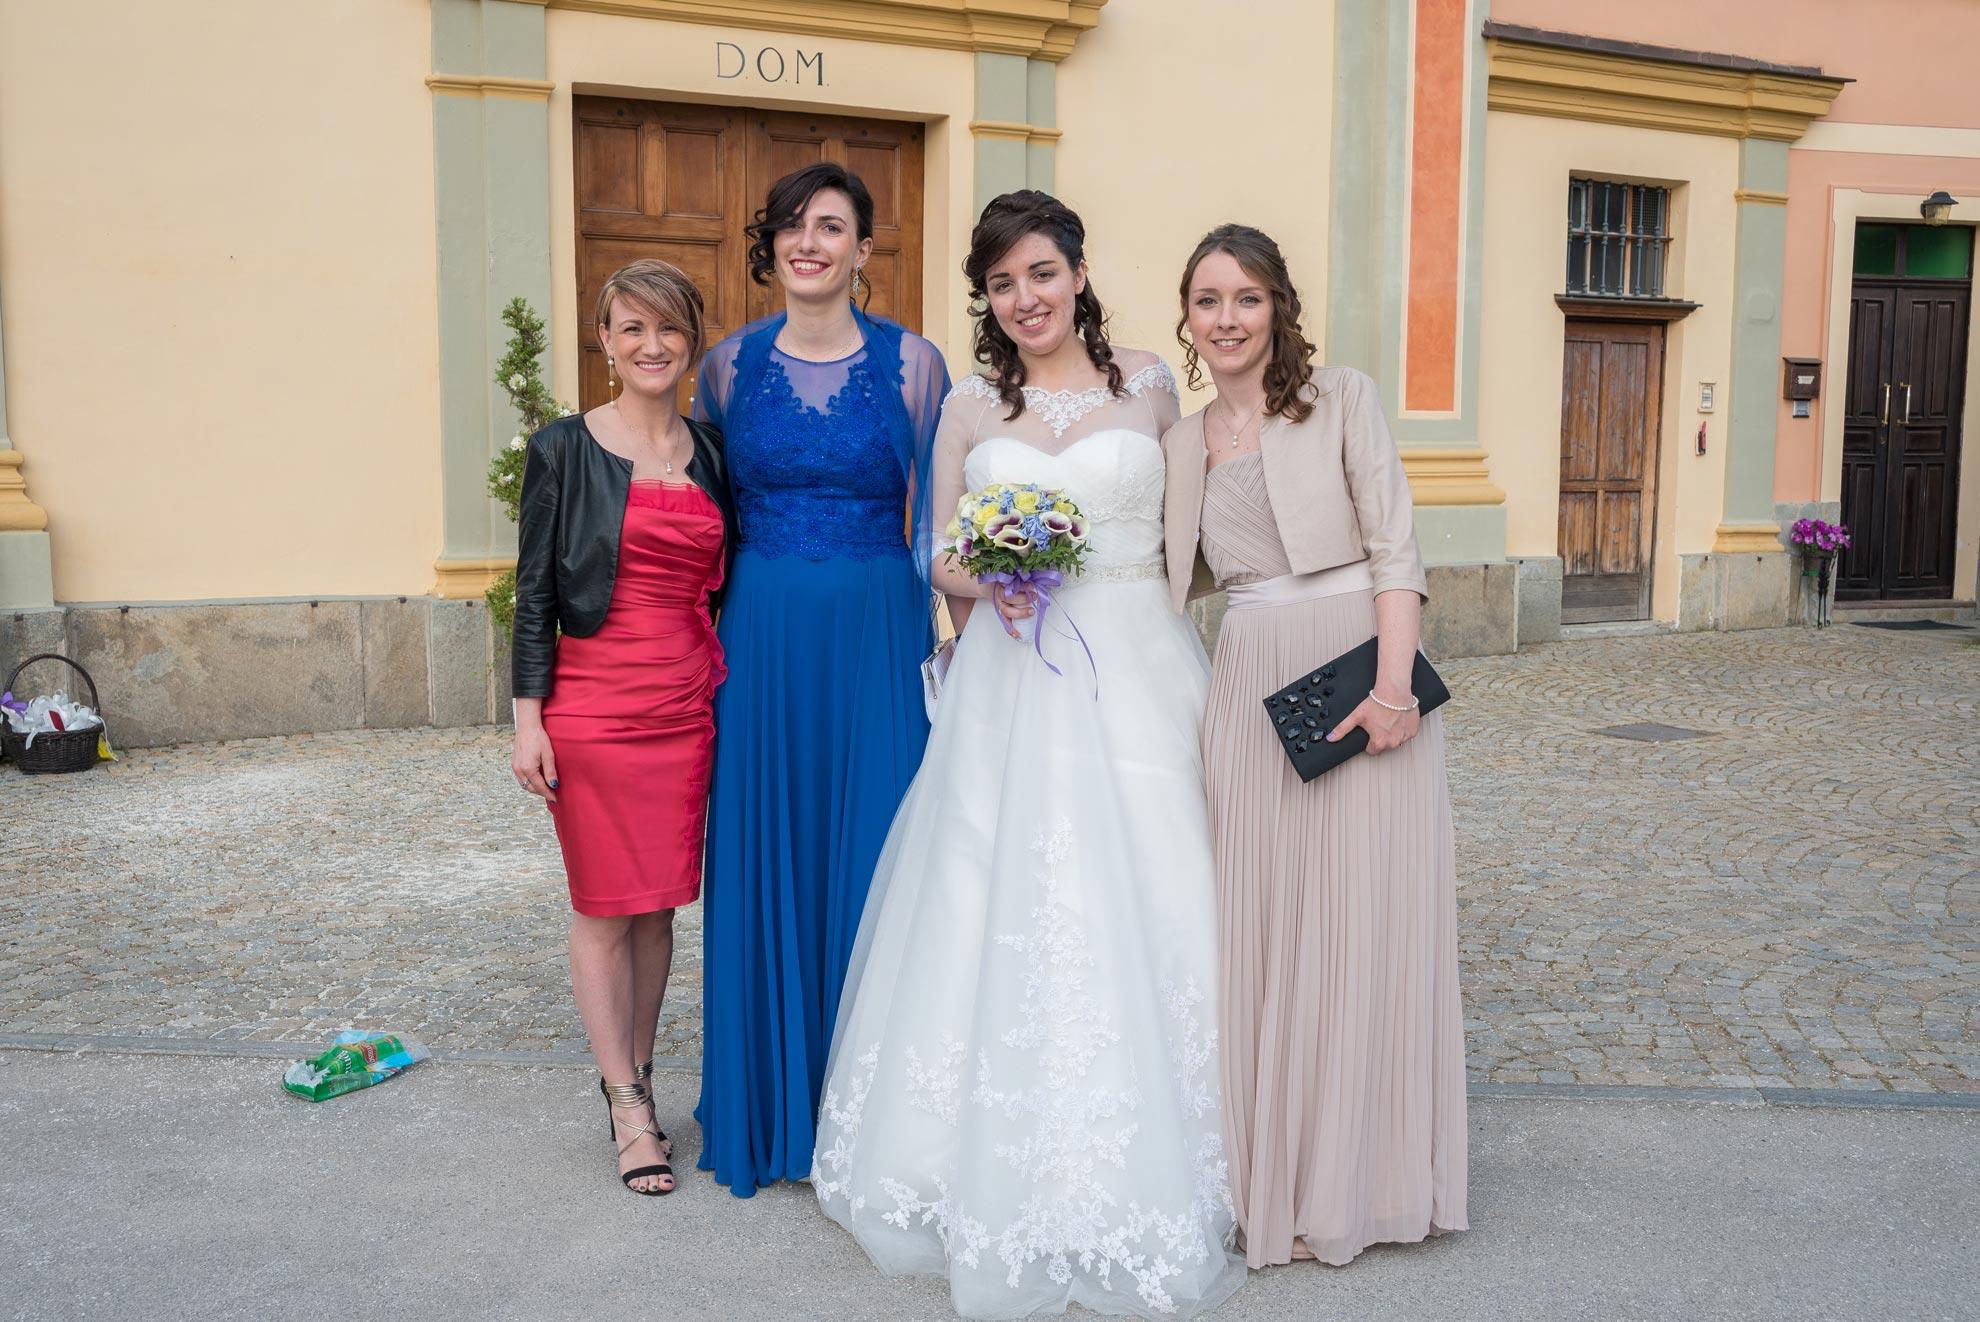 Matrimonio a Narzole Lorenza Diego - DSC 3181 - Fotografie matrimonio amici - Fotografie matrimonio amici